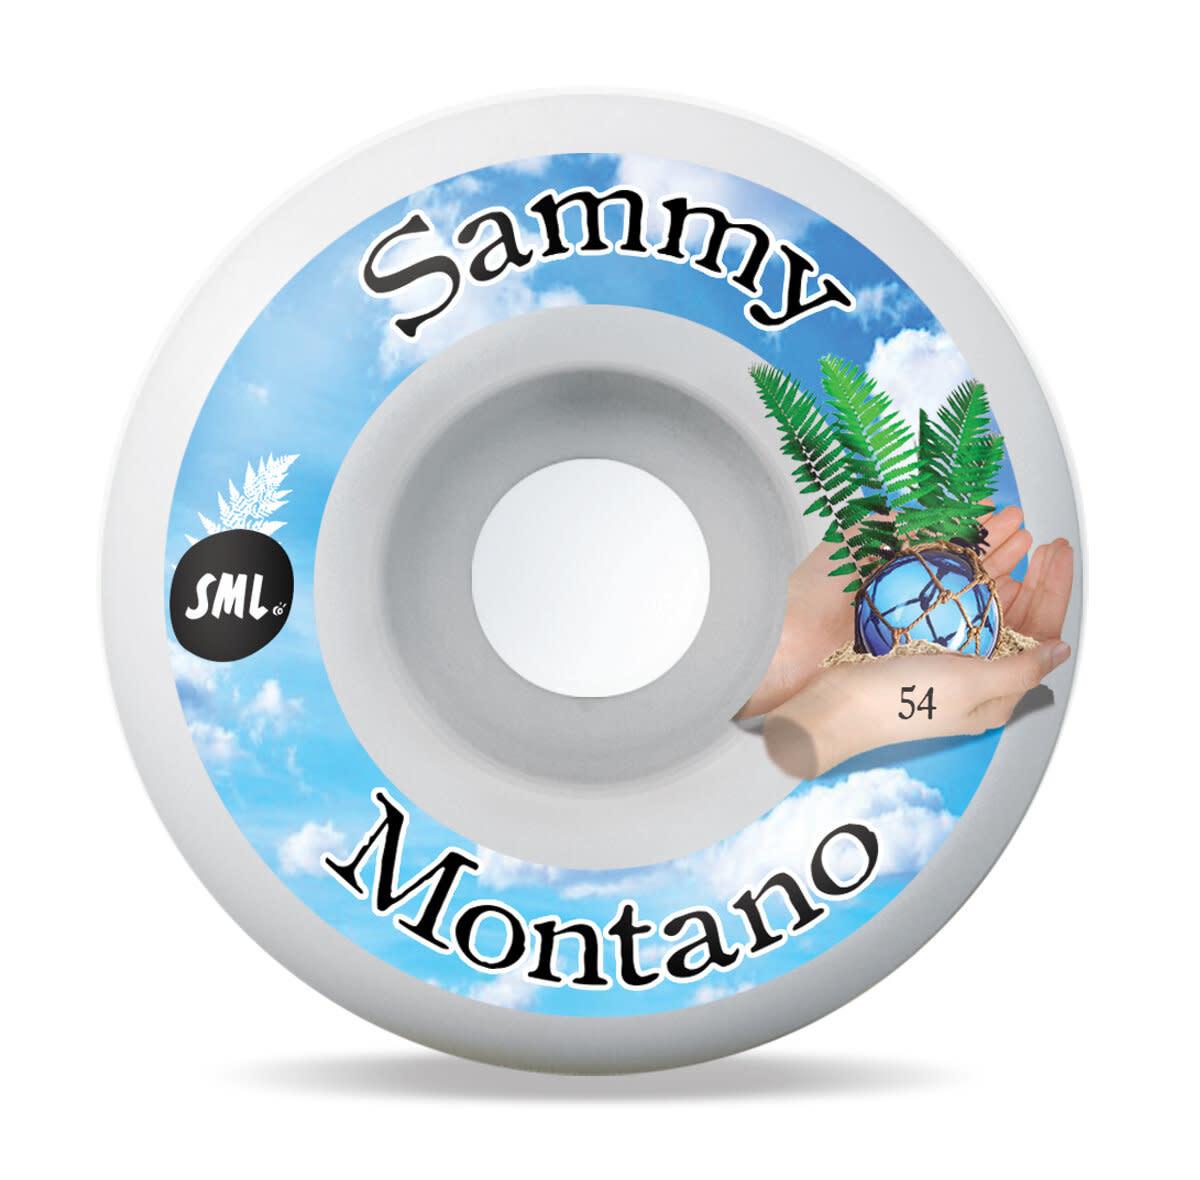 SML. Wheels Tide Pool Montoya OG Wide 99a 54